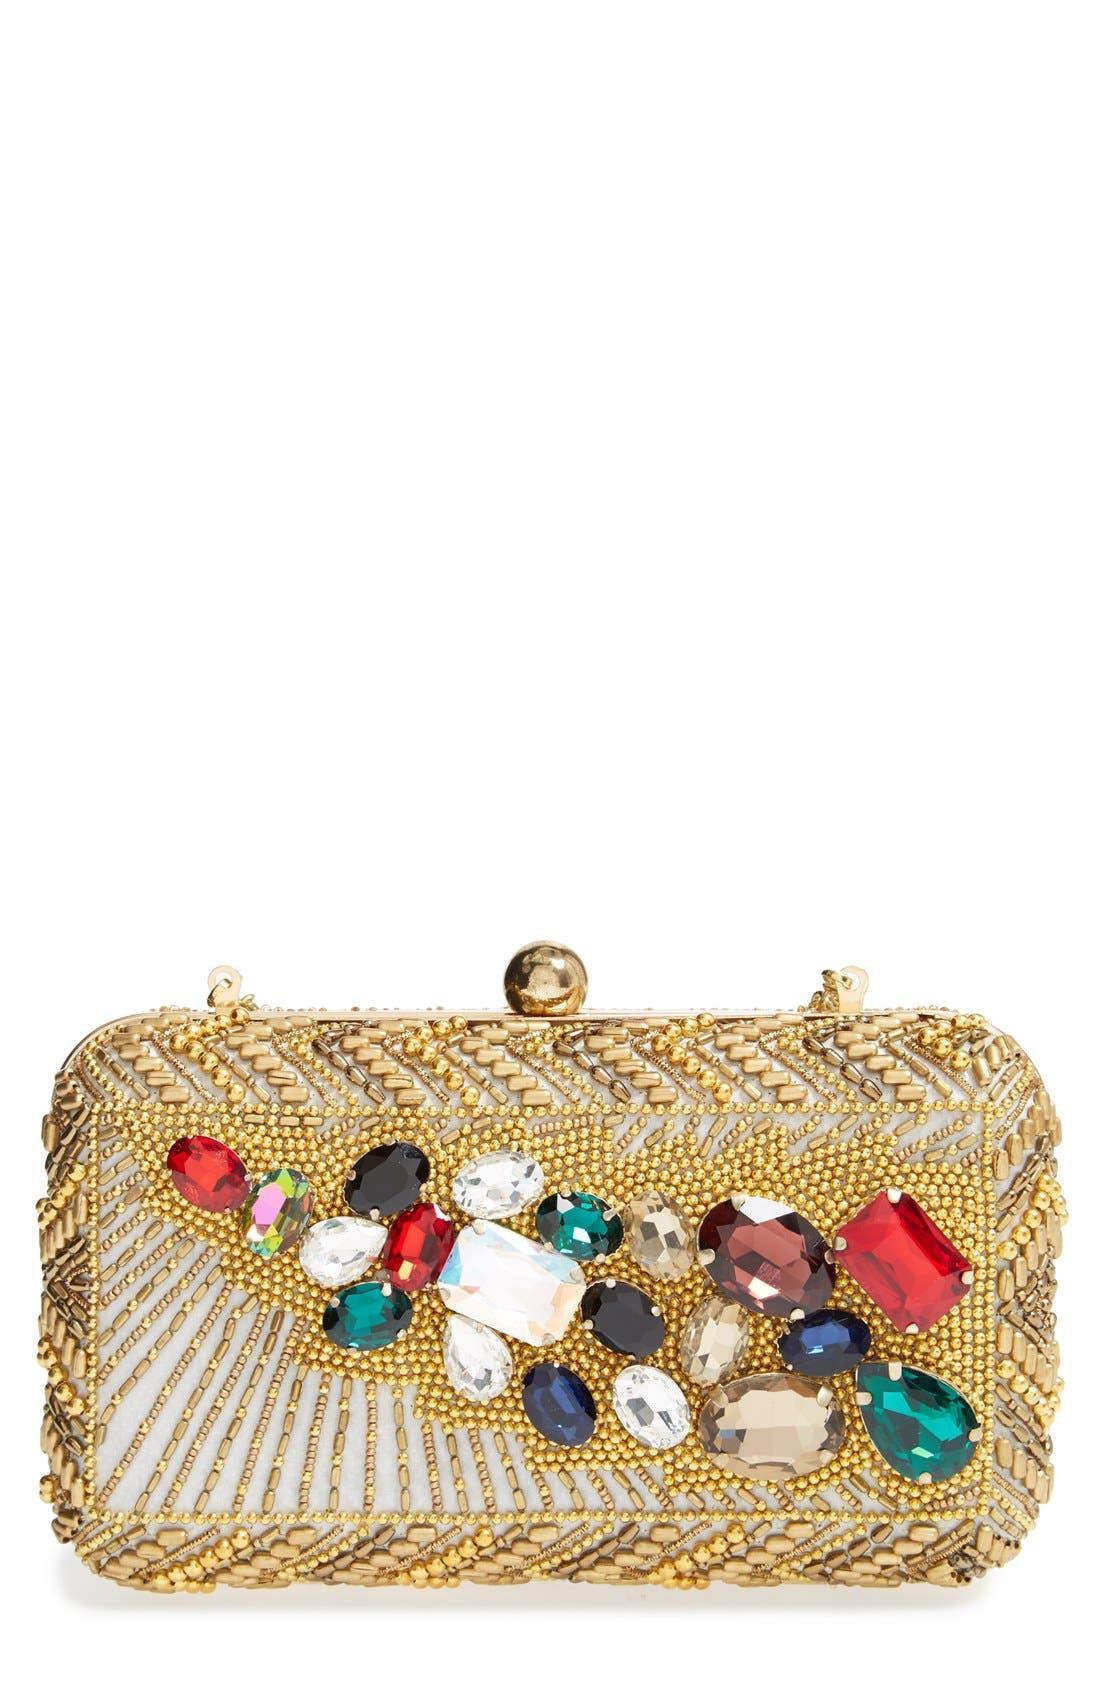 Alternate Image 1 Selected - Natasha Couture 'Left Bank' Embellished Box Clutch